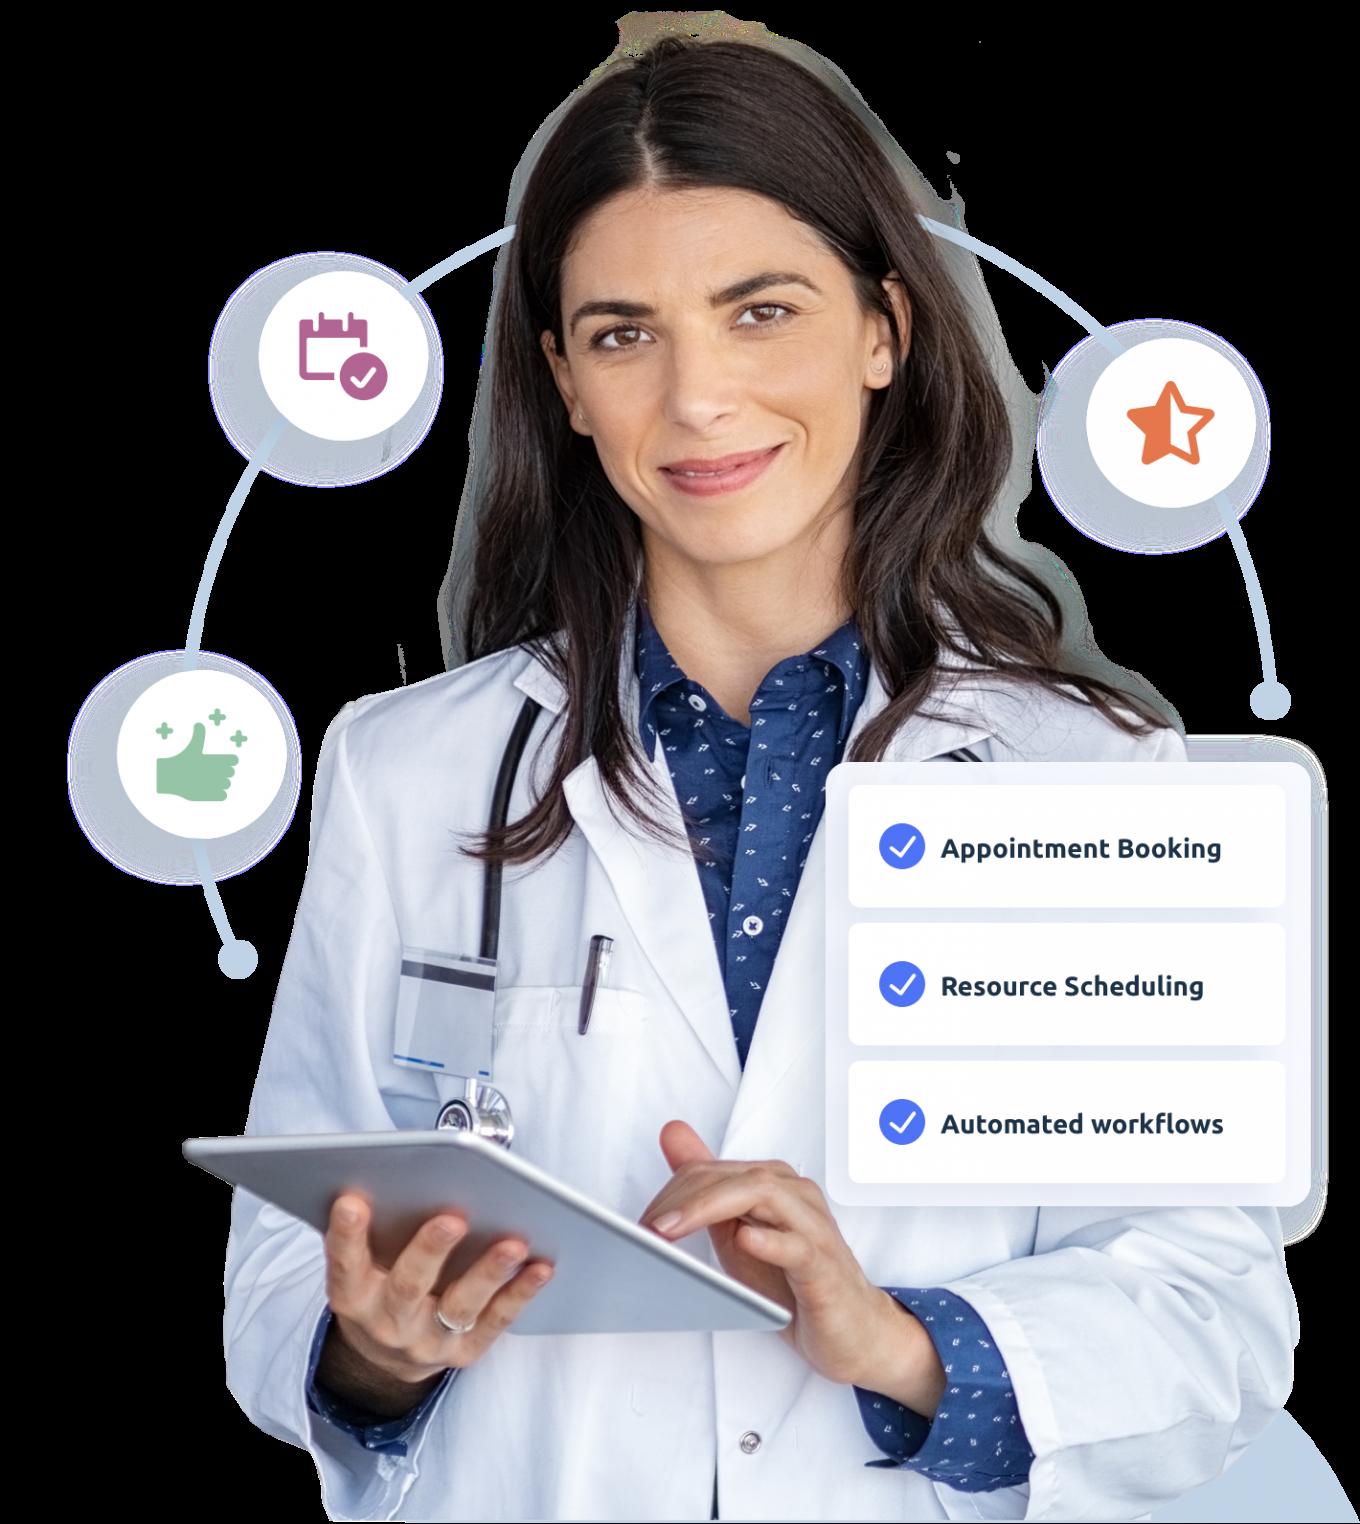 Medische planningssoftware